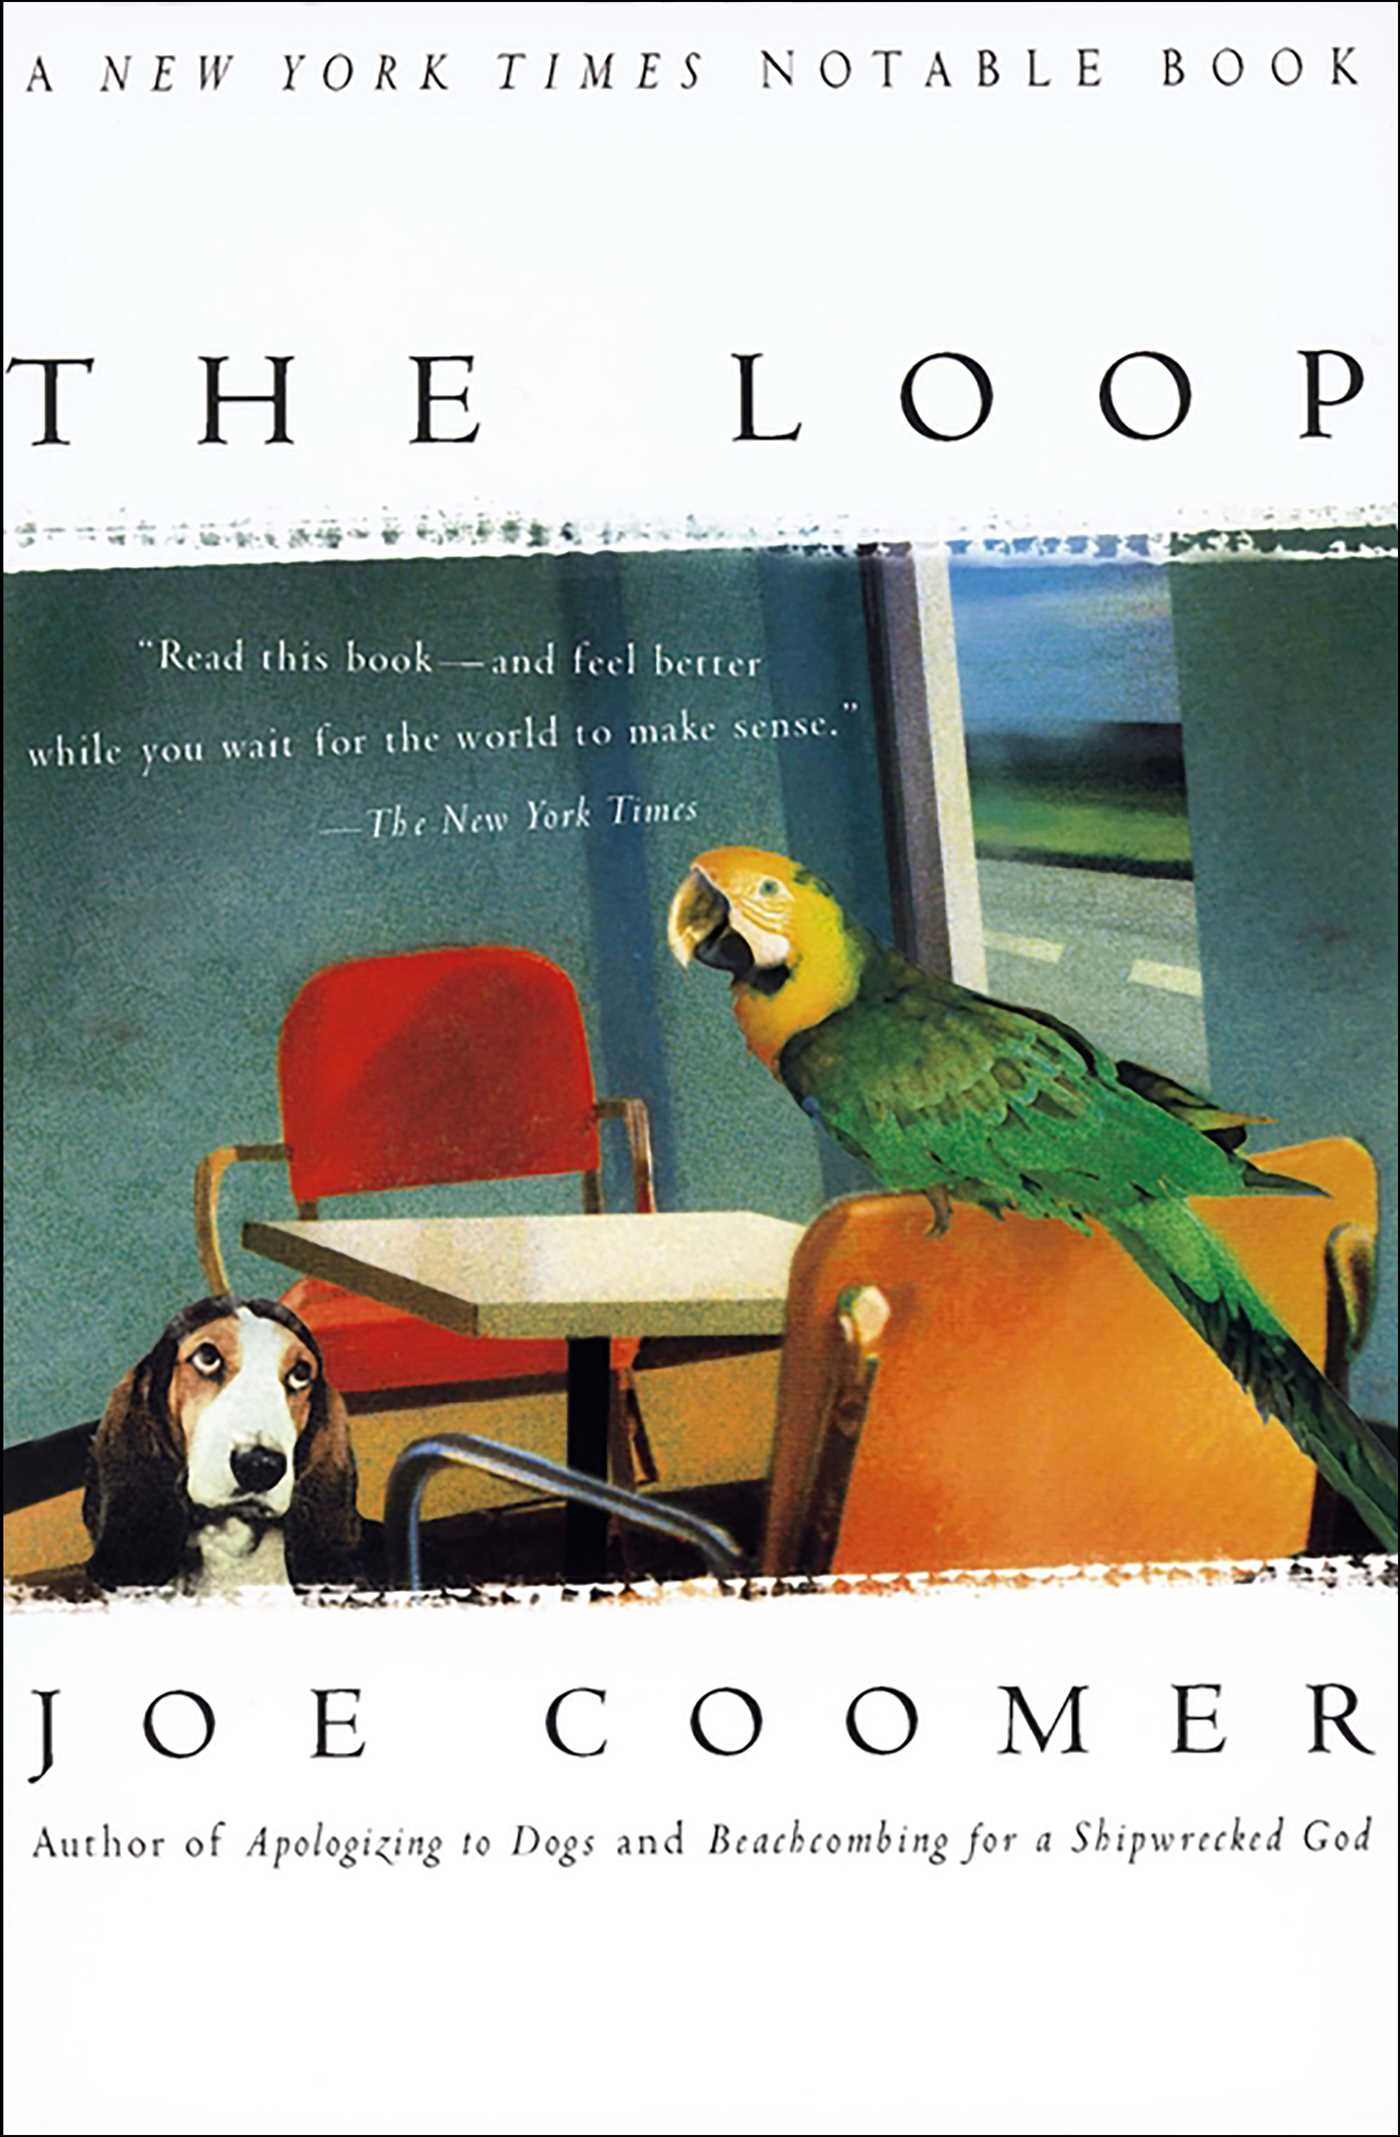 Book Cover Image (jpg): The Loop